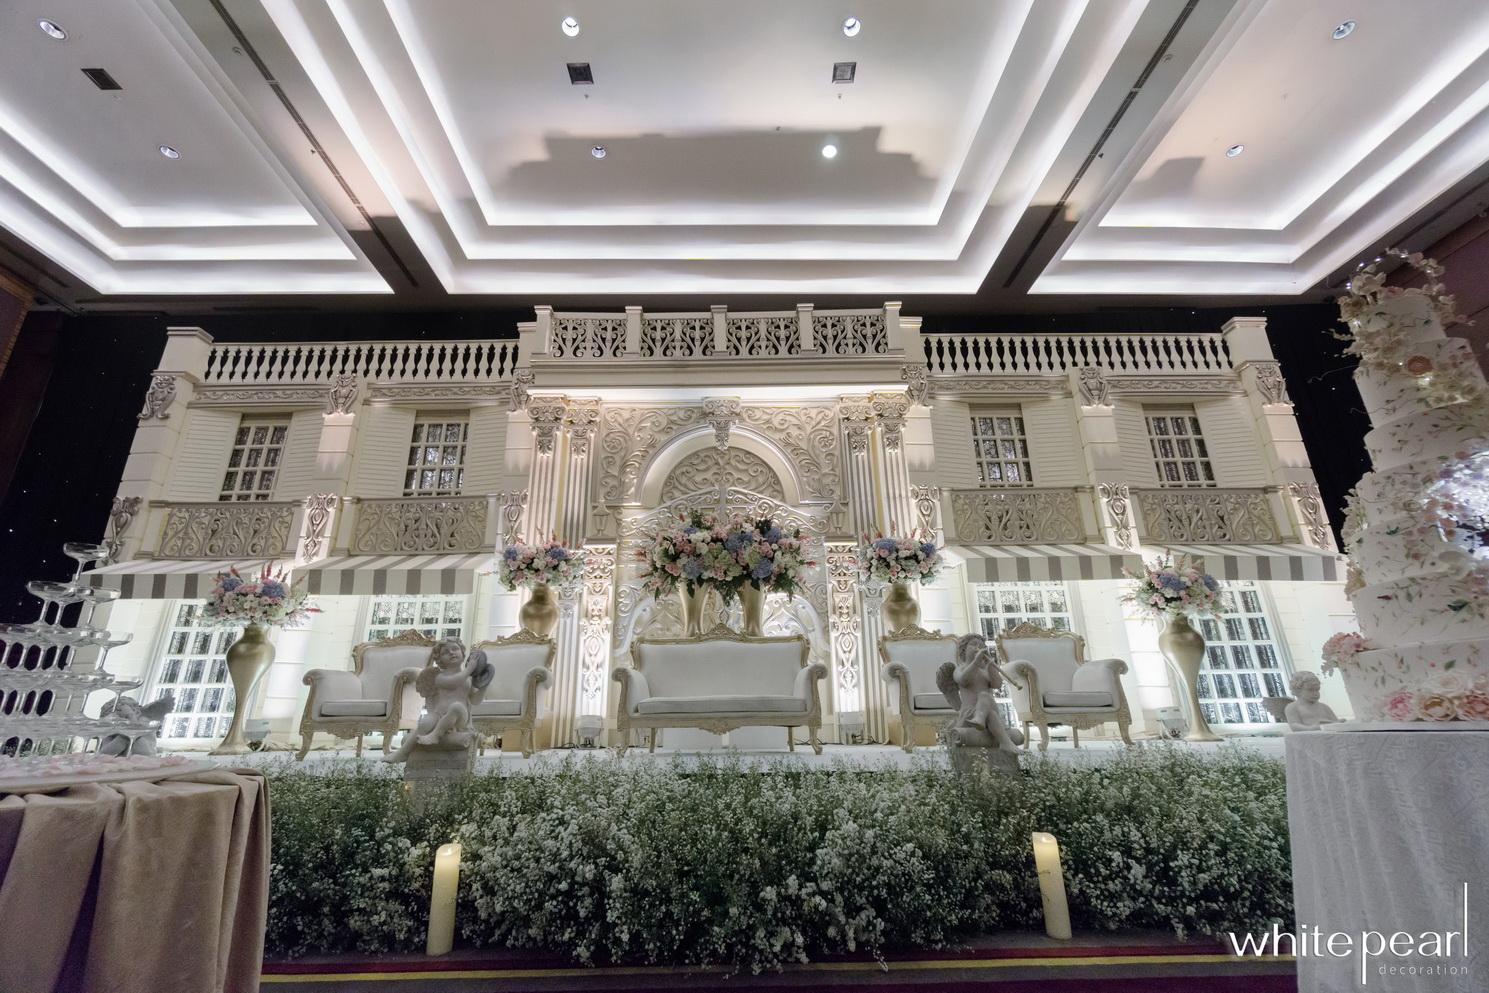 Pullman Cp 2018 06 02 By White Pearl Decoration Bridestorycom